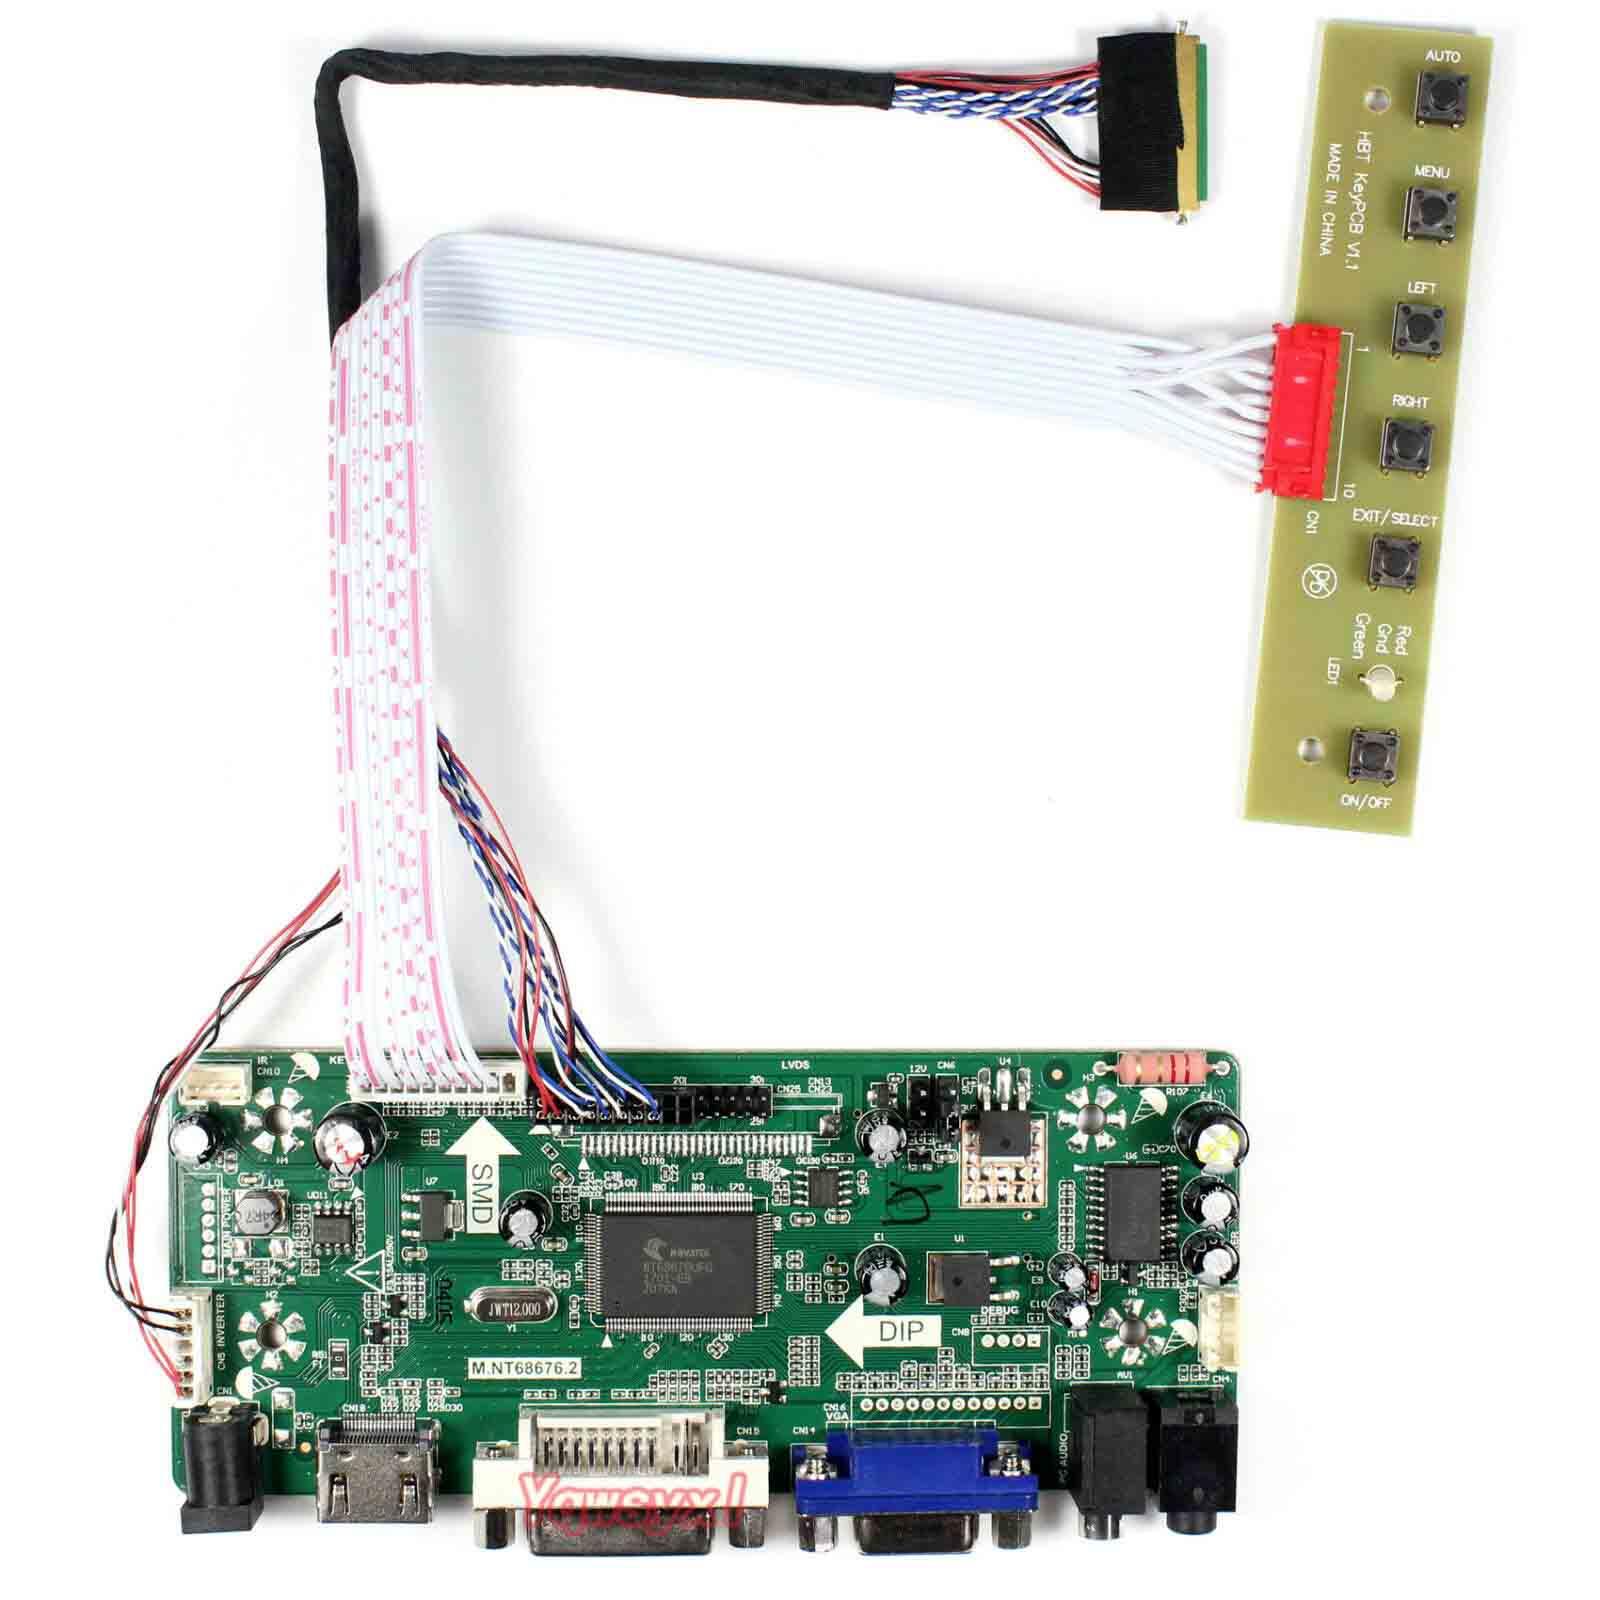 Yqwsyxl Control Board Monitor Kit For B156RW01 V.1  B156RW01 V1 HDMI + DVI + VGA LCD LED  Screen Controller Board Driver